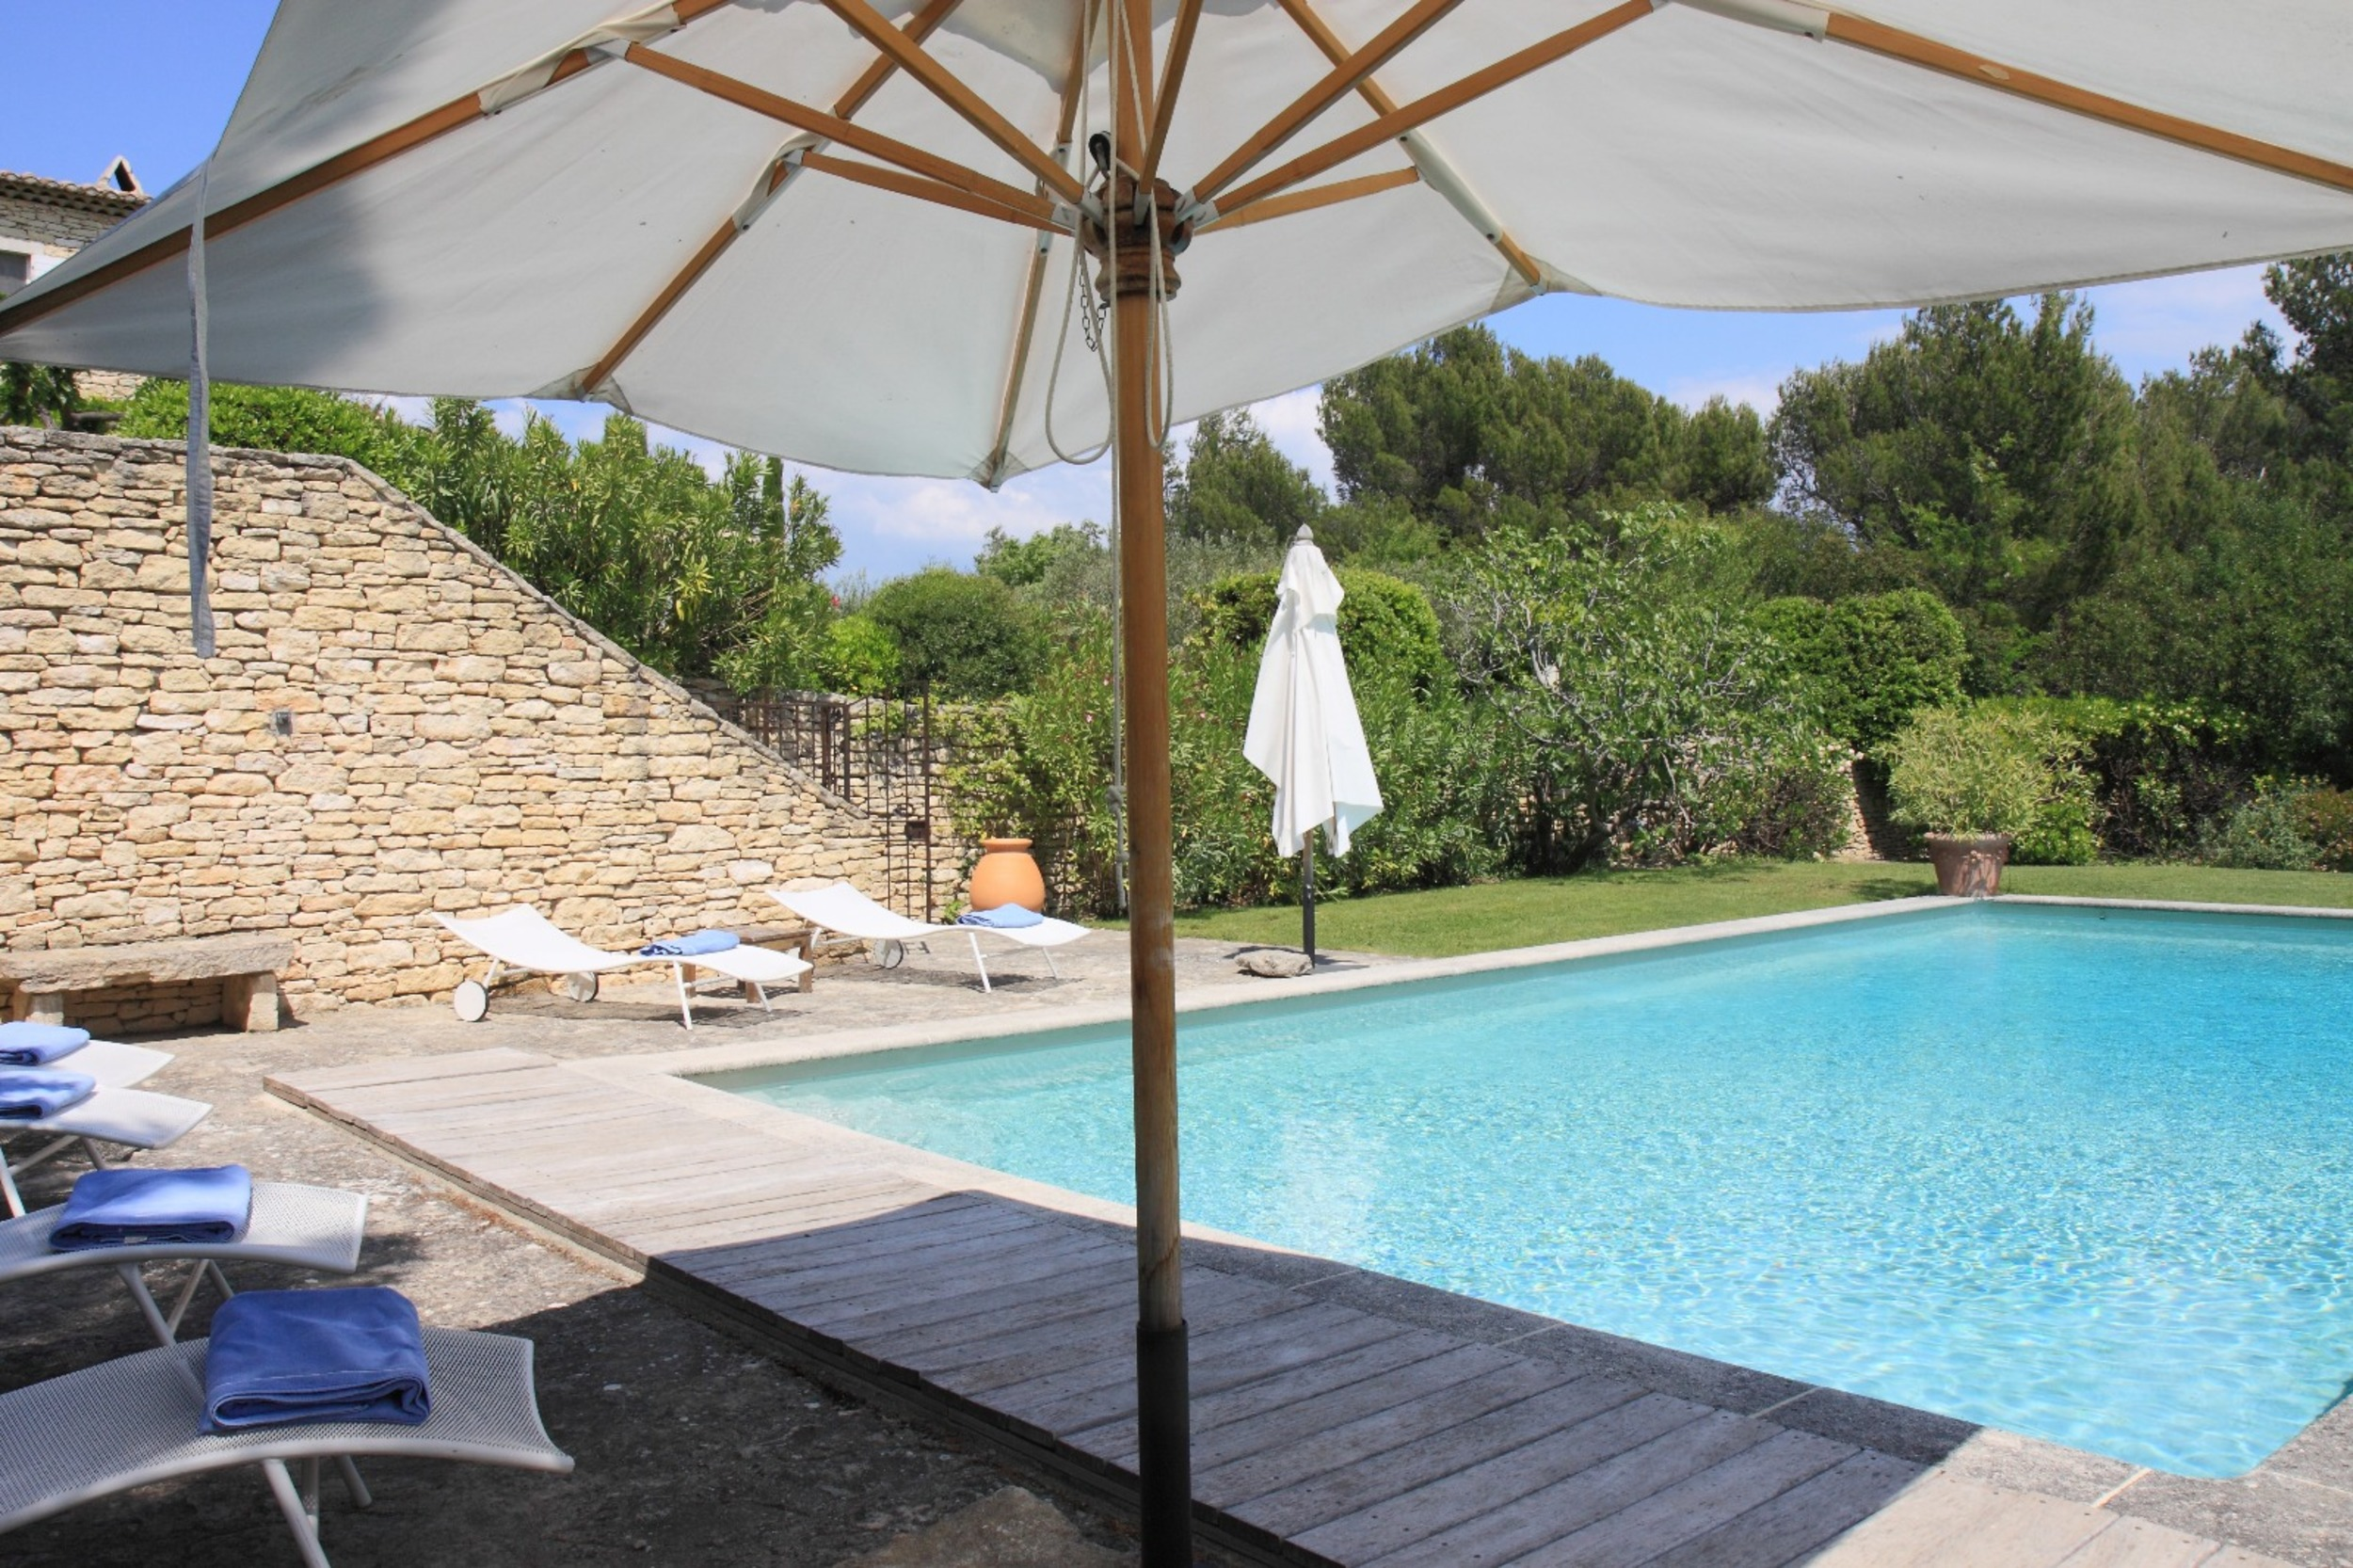 Holiday house Der Fall - Fabelhaftes Landhaus in Gordes (2520443), Gordes, Vaucluse, Provence - Alps - Côte d'Azur, France, picture 3